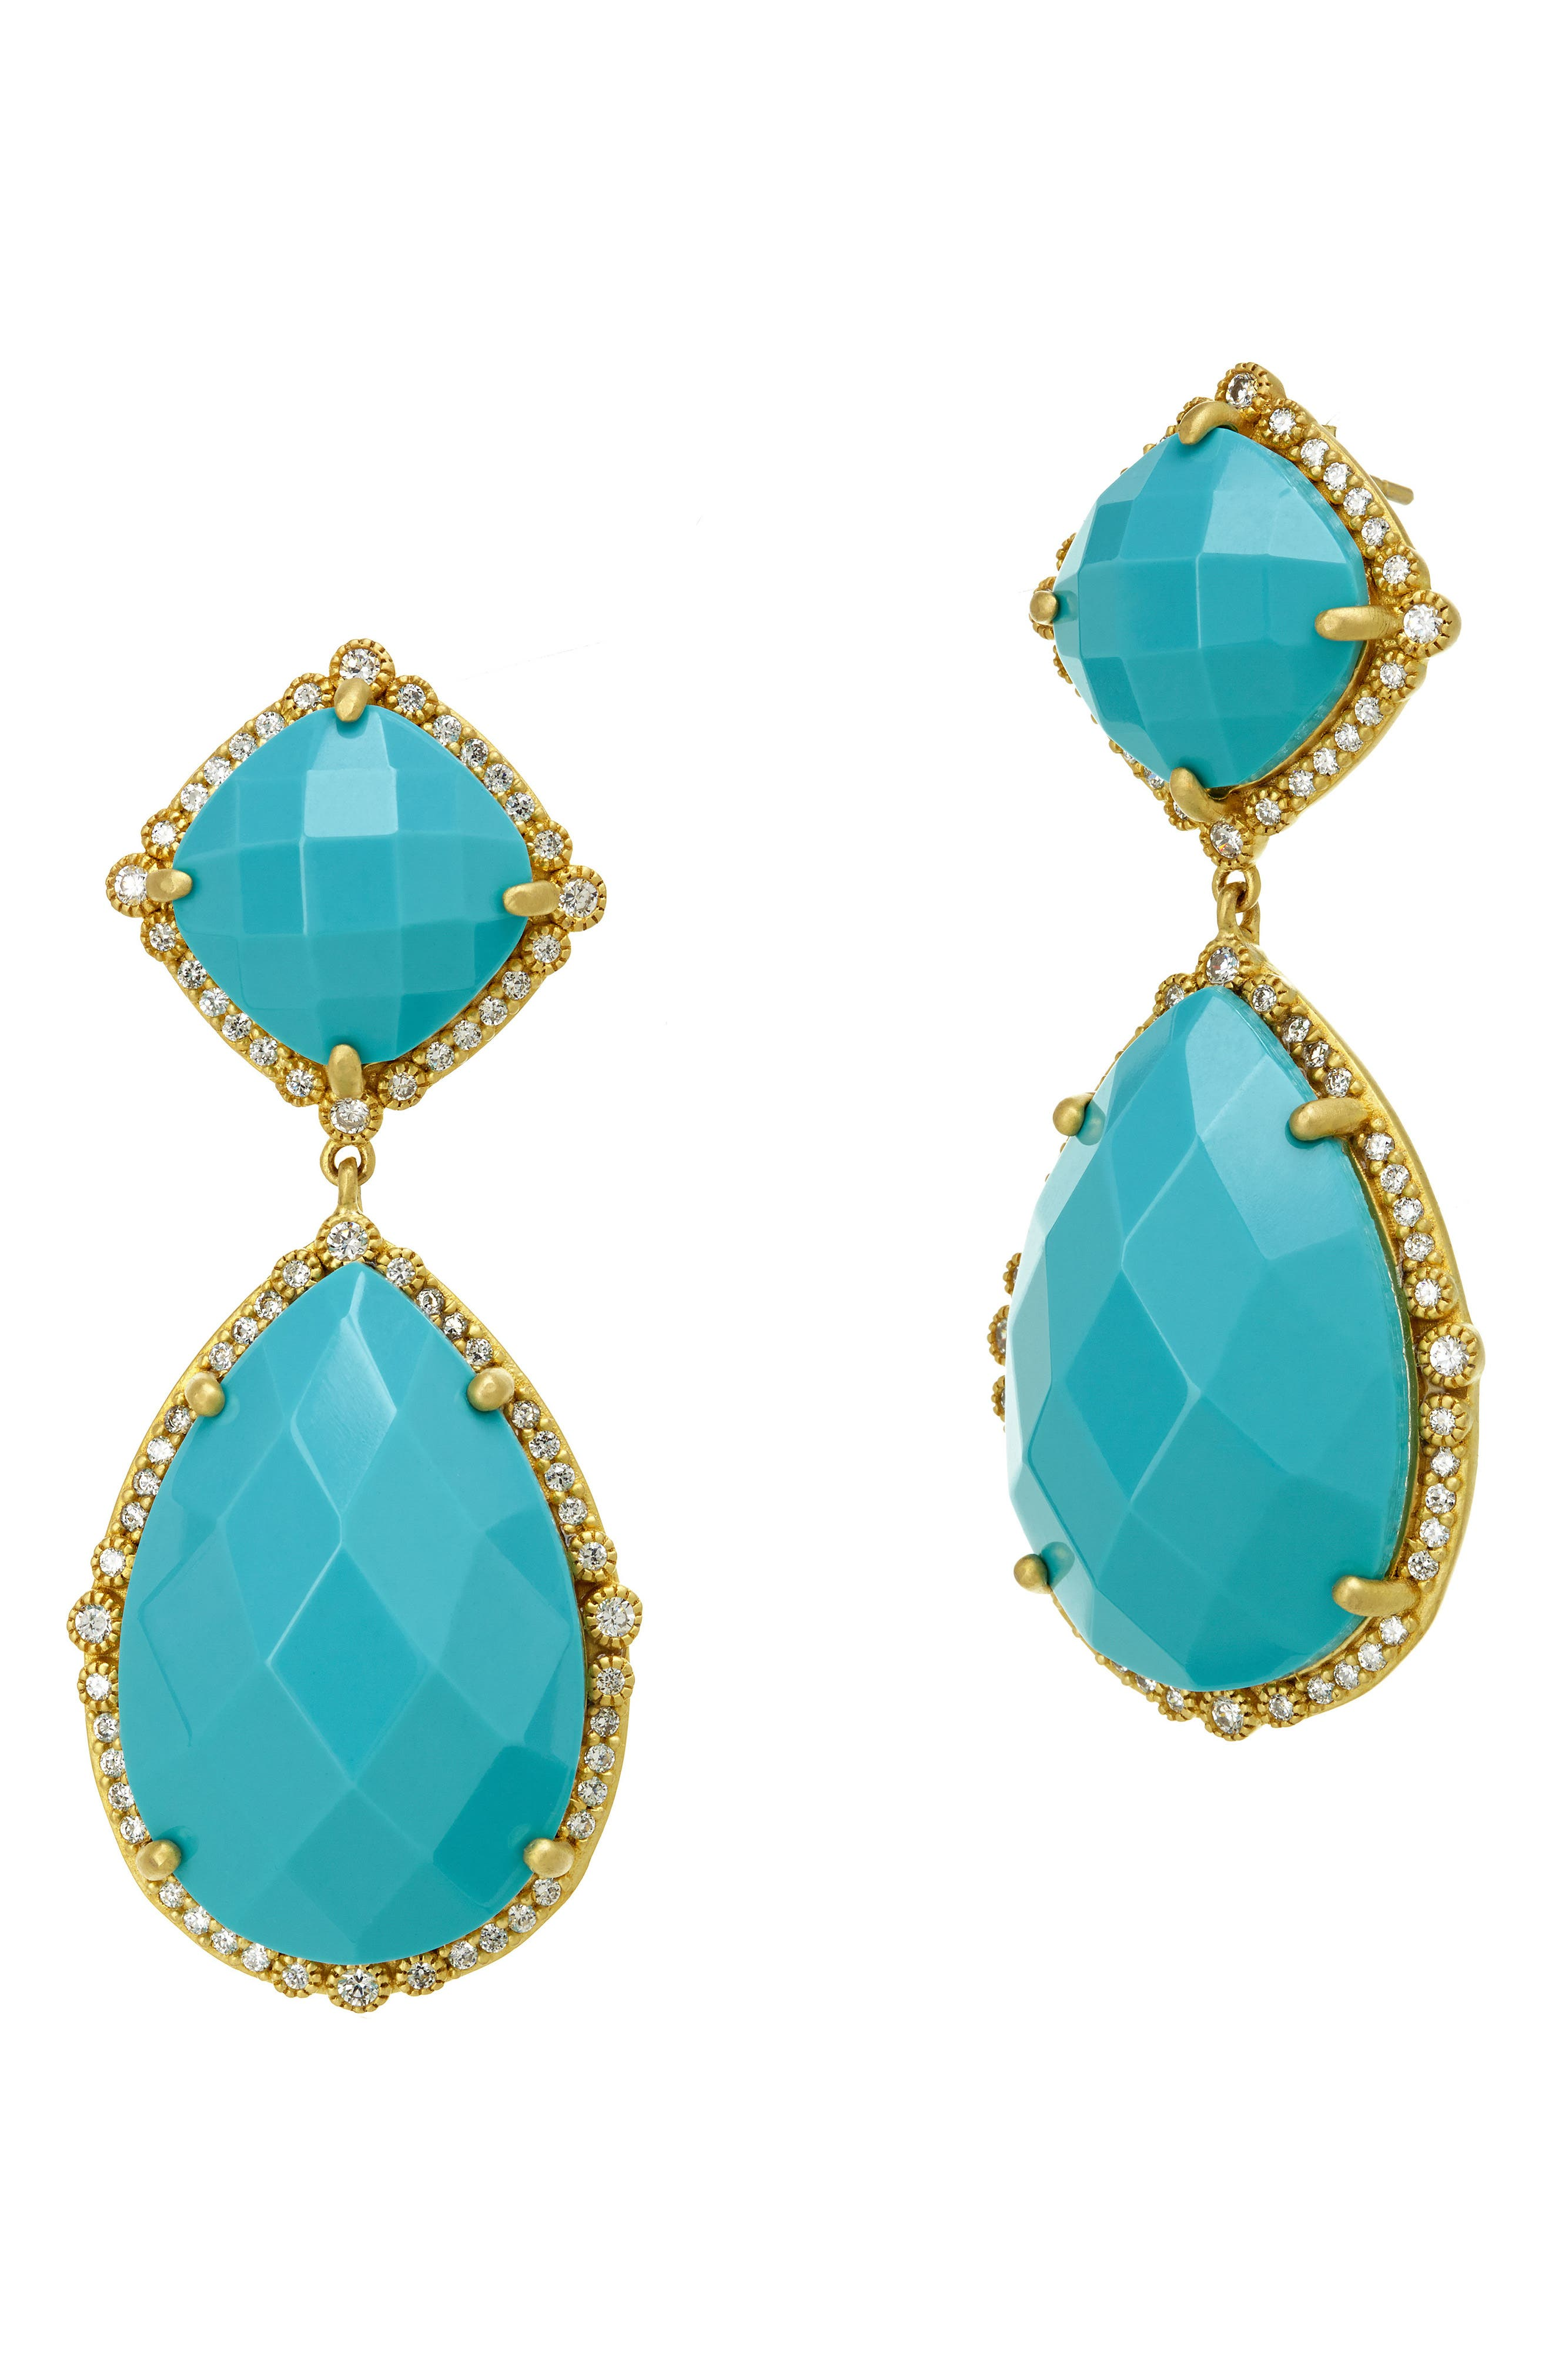 Alternate Image 1 Selected - FREIDA ROTHMAN 'Metropolitan' Stone Drop Earrings